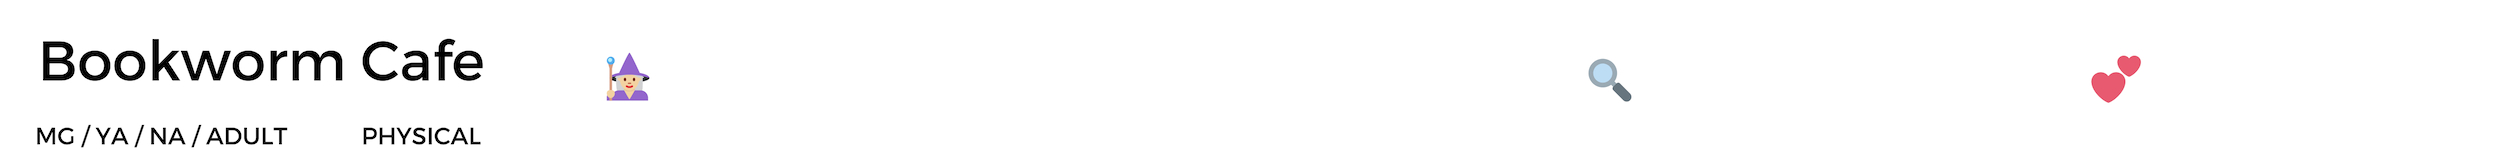 BOOK BLOG COMMUNITY _ BANNER + PROFILES [2500 x 150] (1).jpg